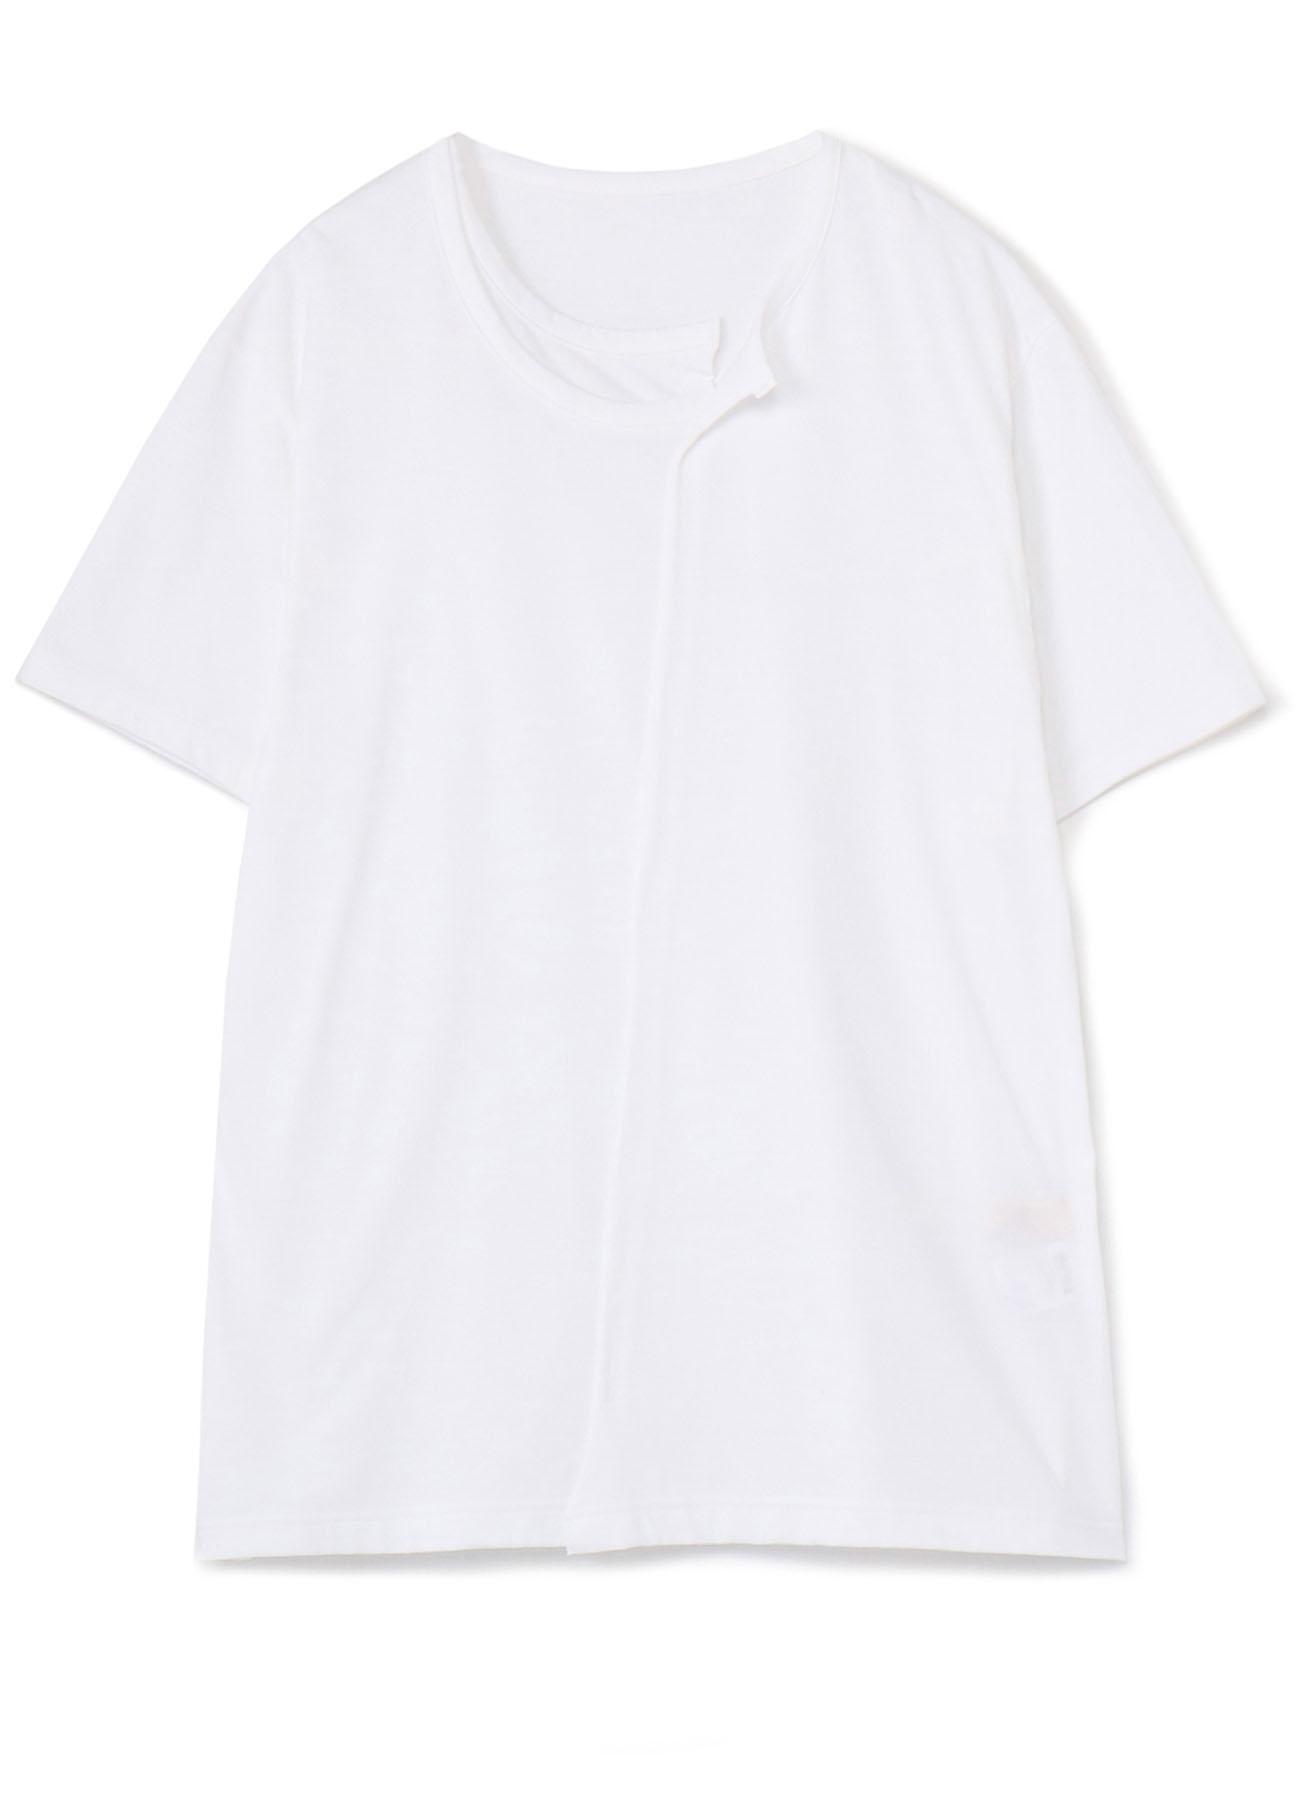 30/Cotton Jersey Collar Deformed Short Sleeves Cut Sew